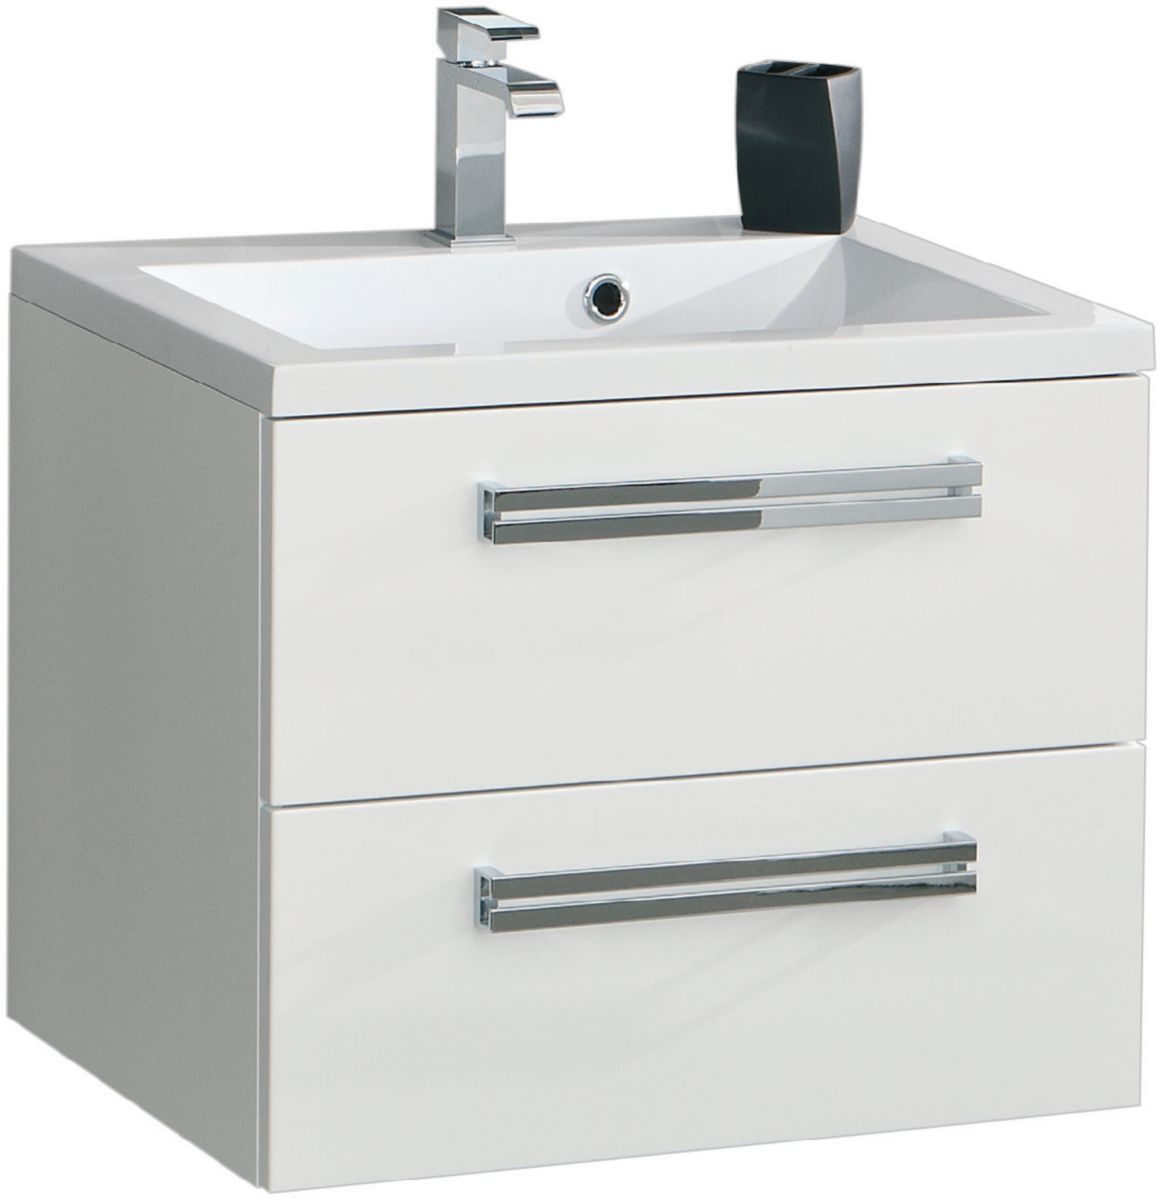 Meuble sous vasque SEDUCTA 60 cm 2 tiroirs gris perle ALTERNA